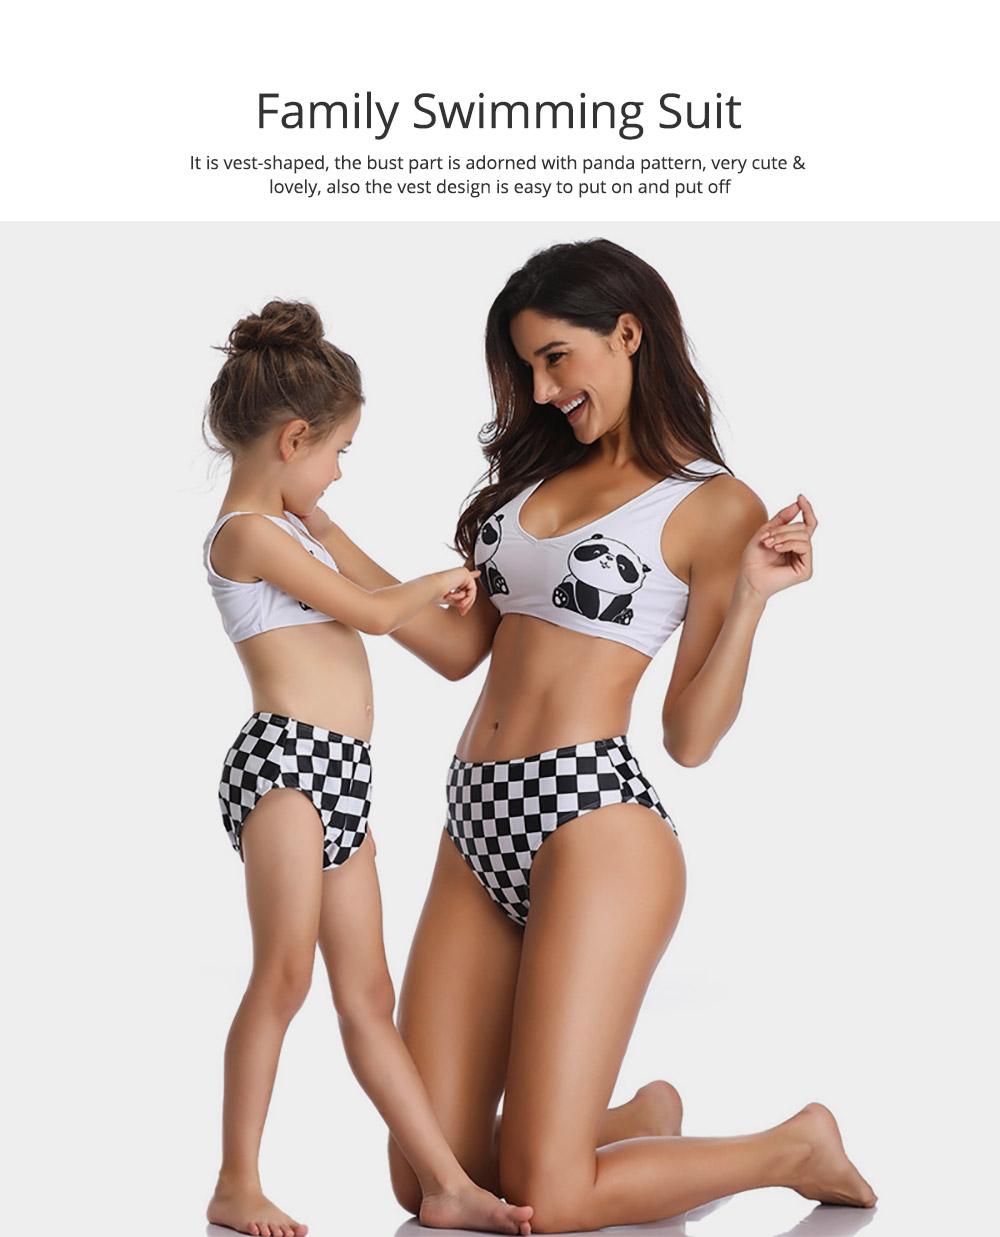 Panda Pattern Cute Mother and Daughter Swimming Suit Family Matching Swimwear 2